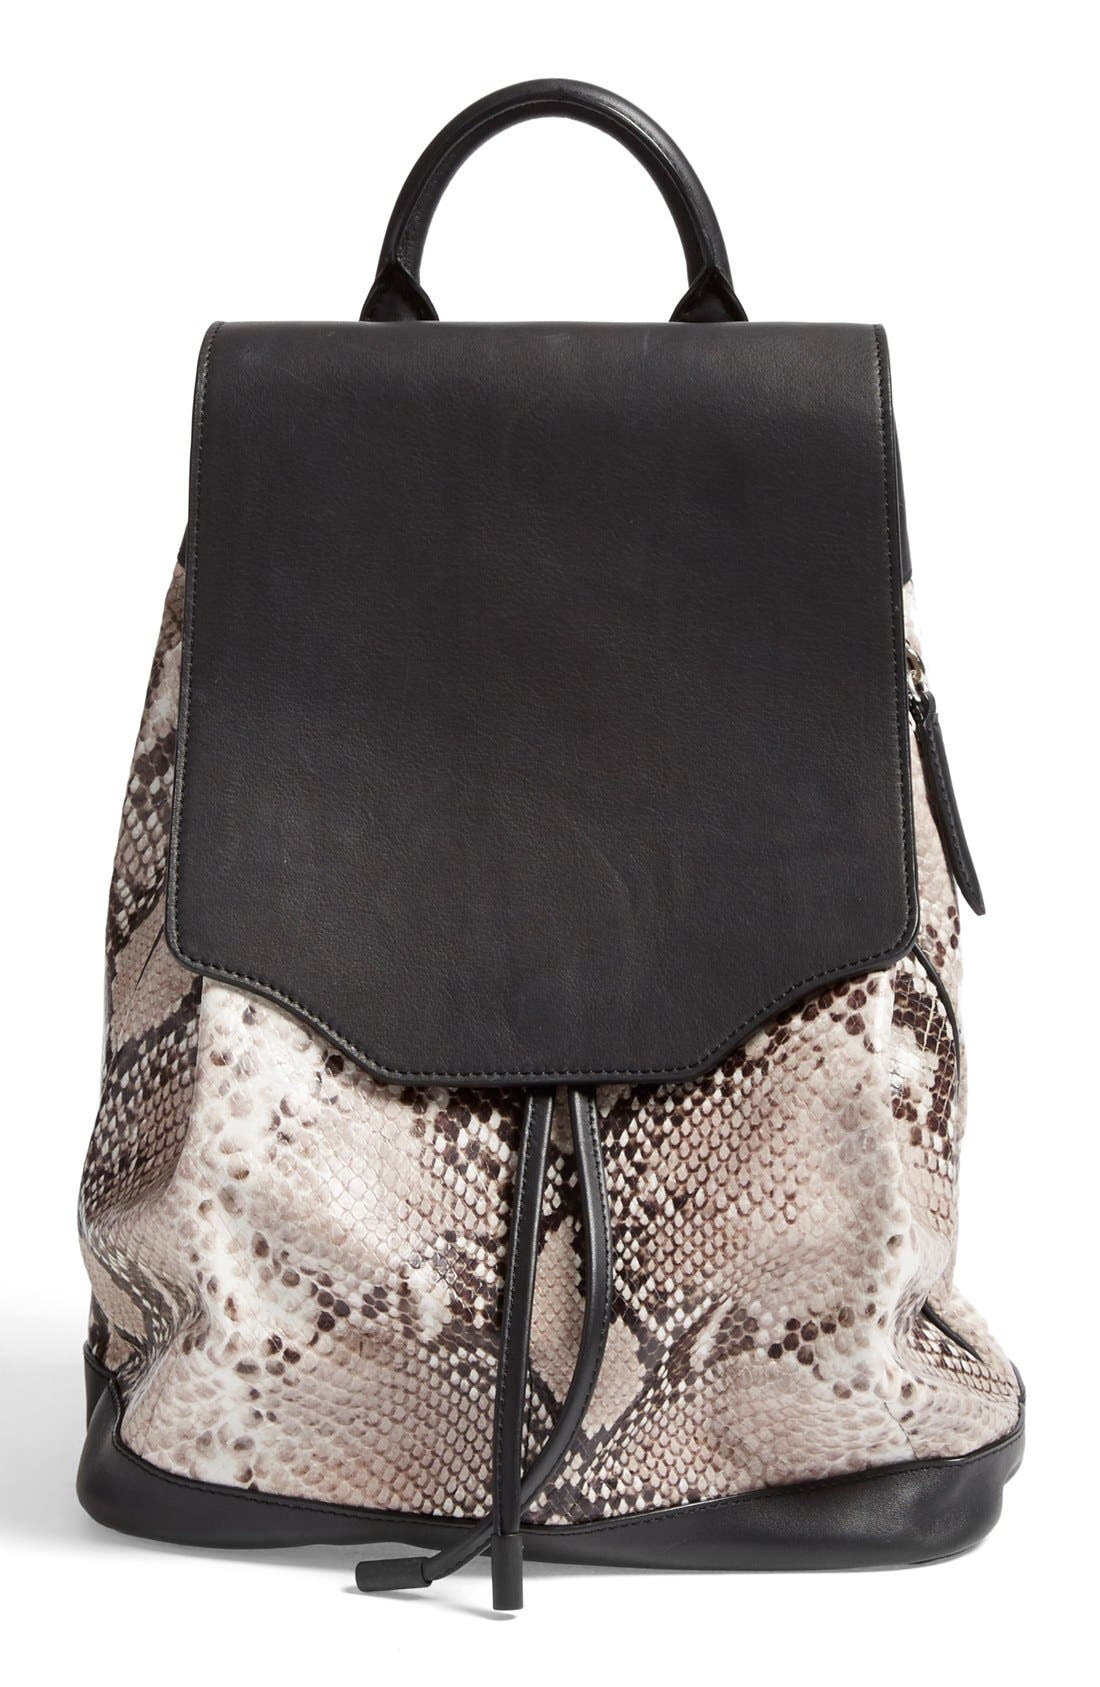 Main Image - rag & bone 'Pilot' Snake Embossed Leather Backpack